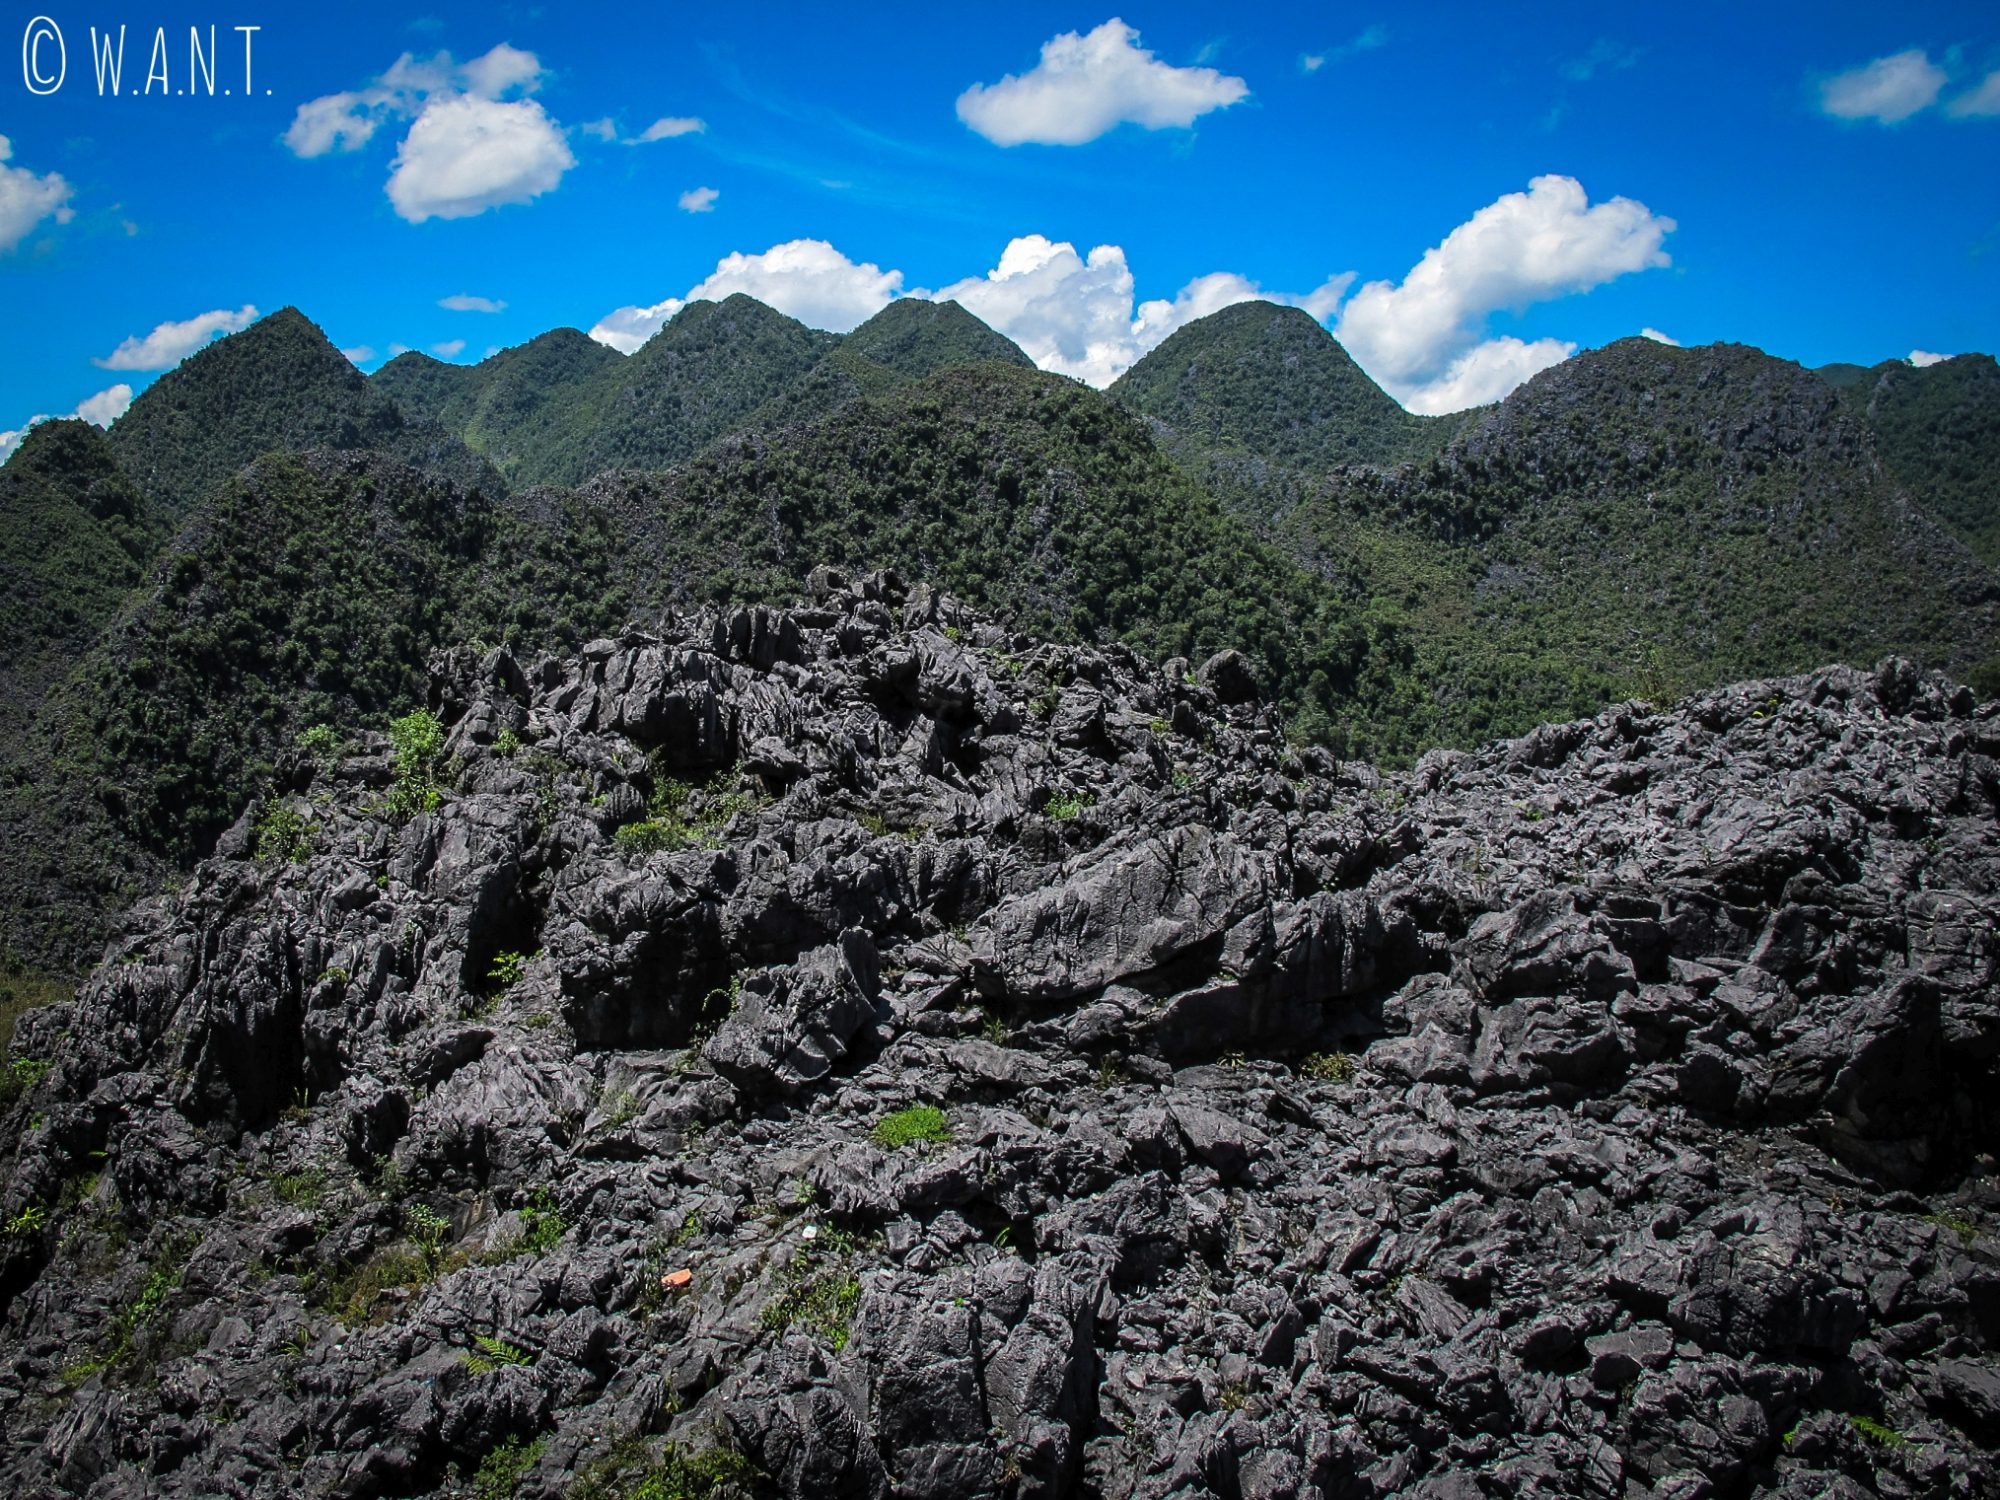 Paysage de roche noire saillante entre Dong Van et Sa Phin